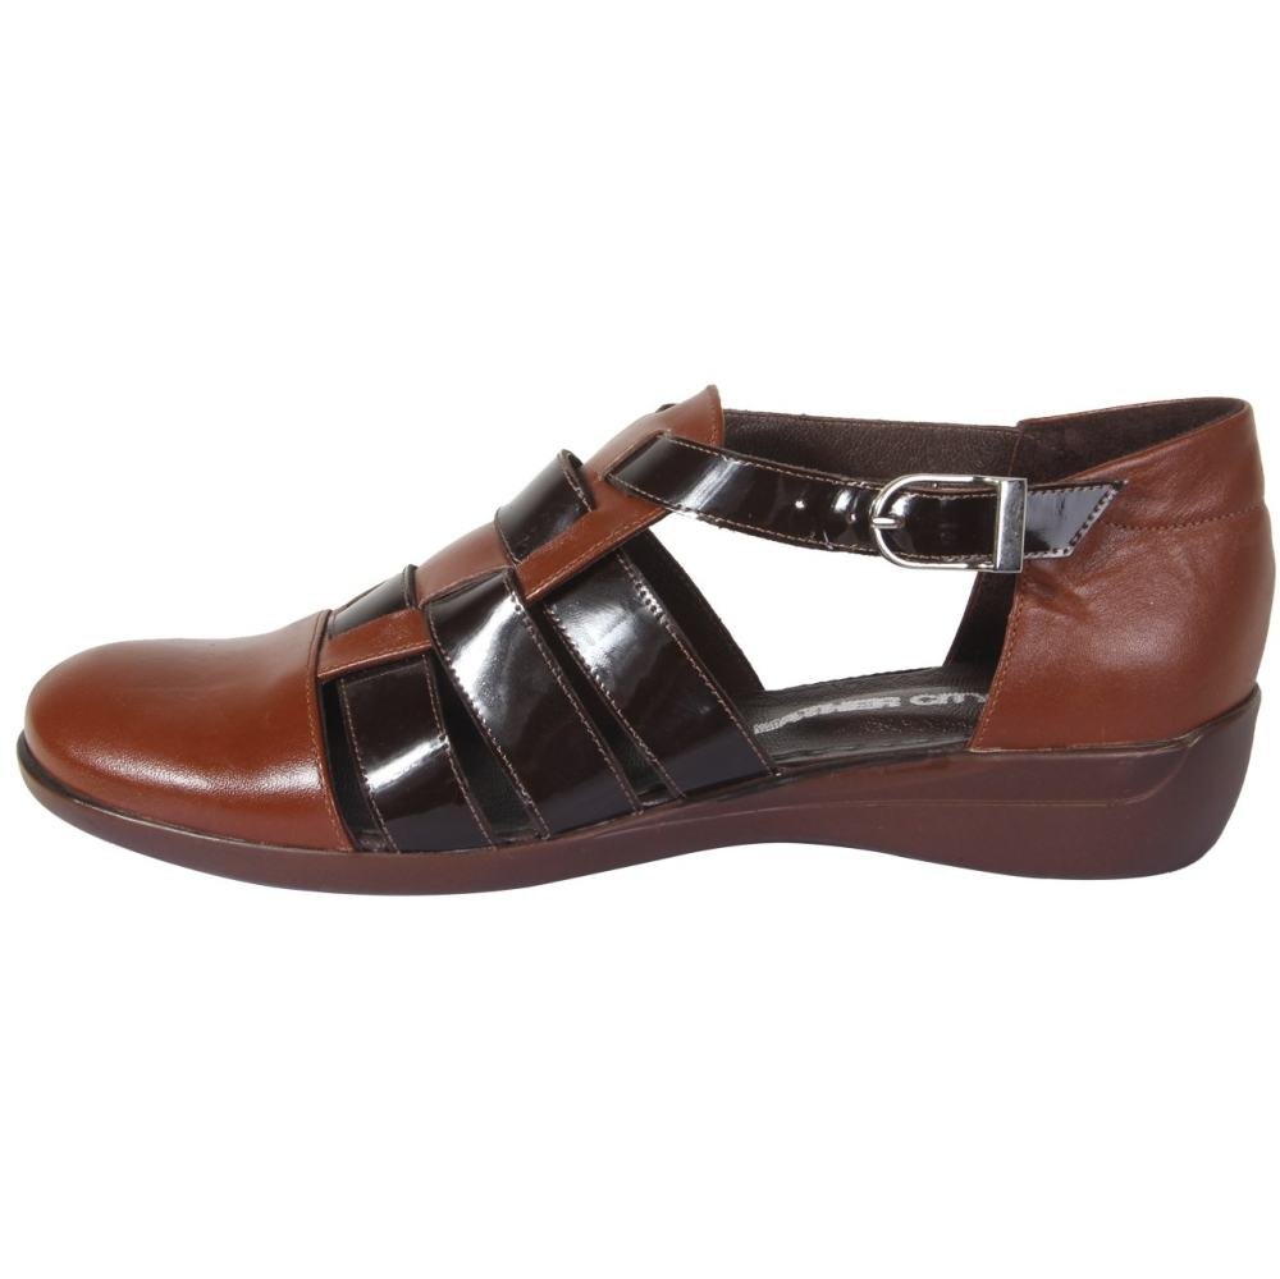 کفش چرم زنانه شهر چرم مدل 66-39236